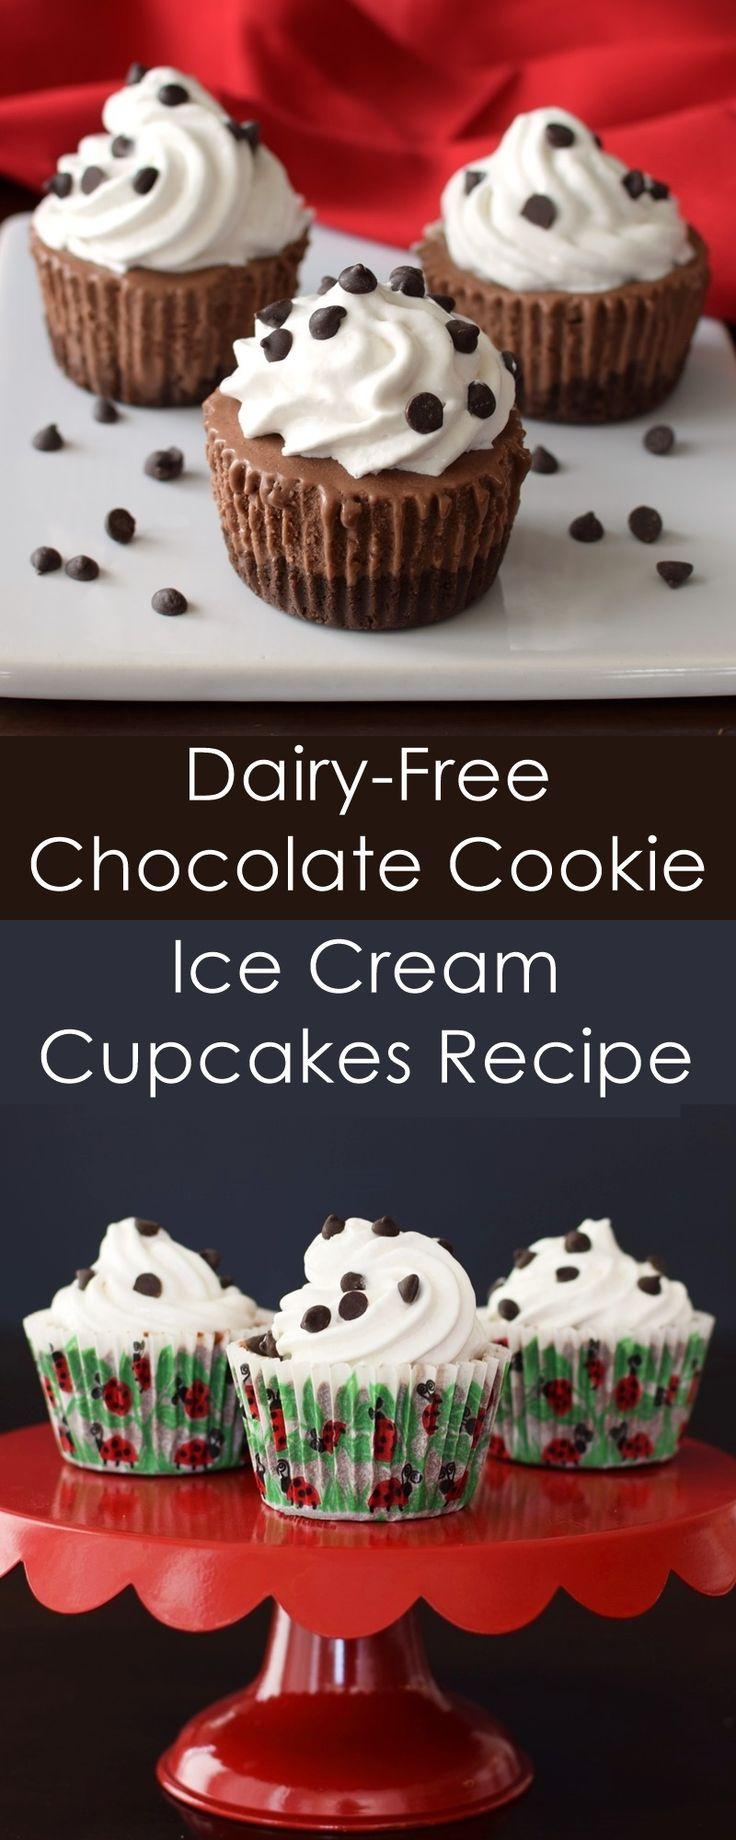 Dairy-Free Triple Chocolate Ice Cream Cupcakes - vegan, gluten-free, allergy-friendly recipe!